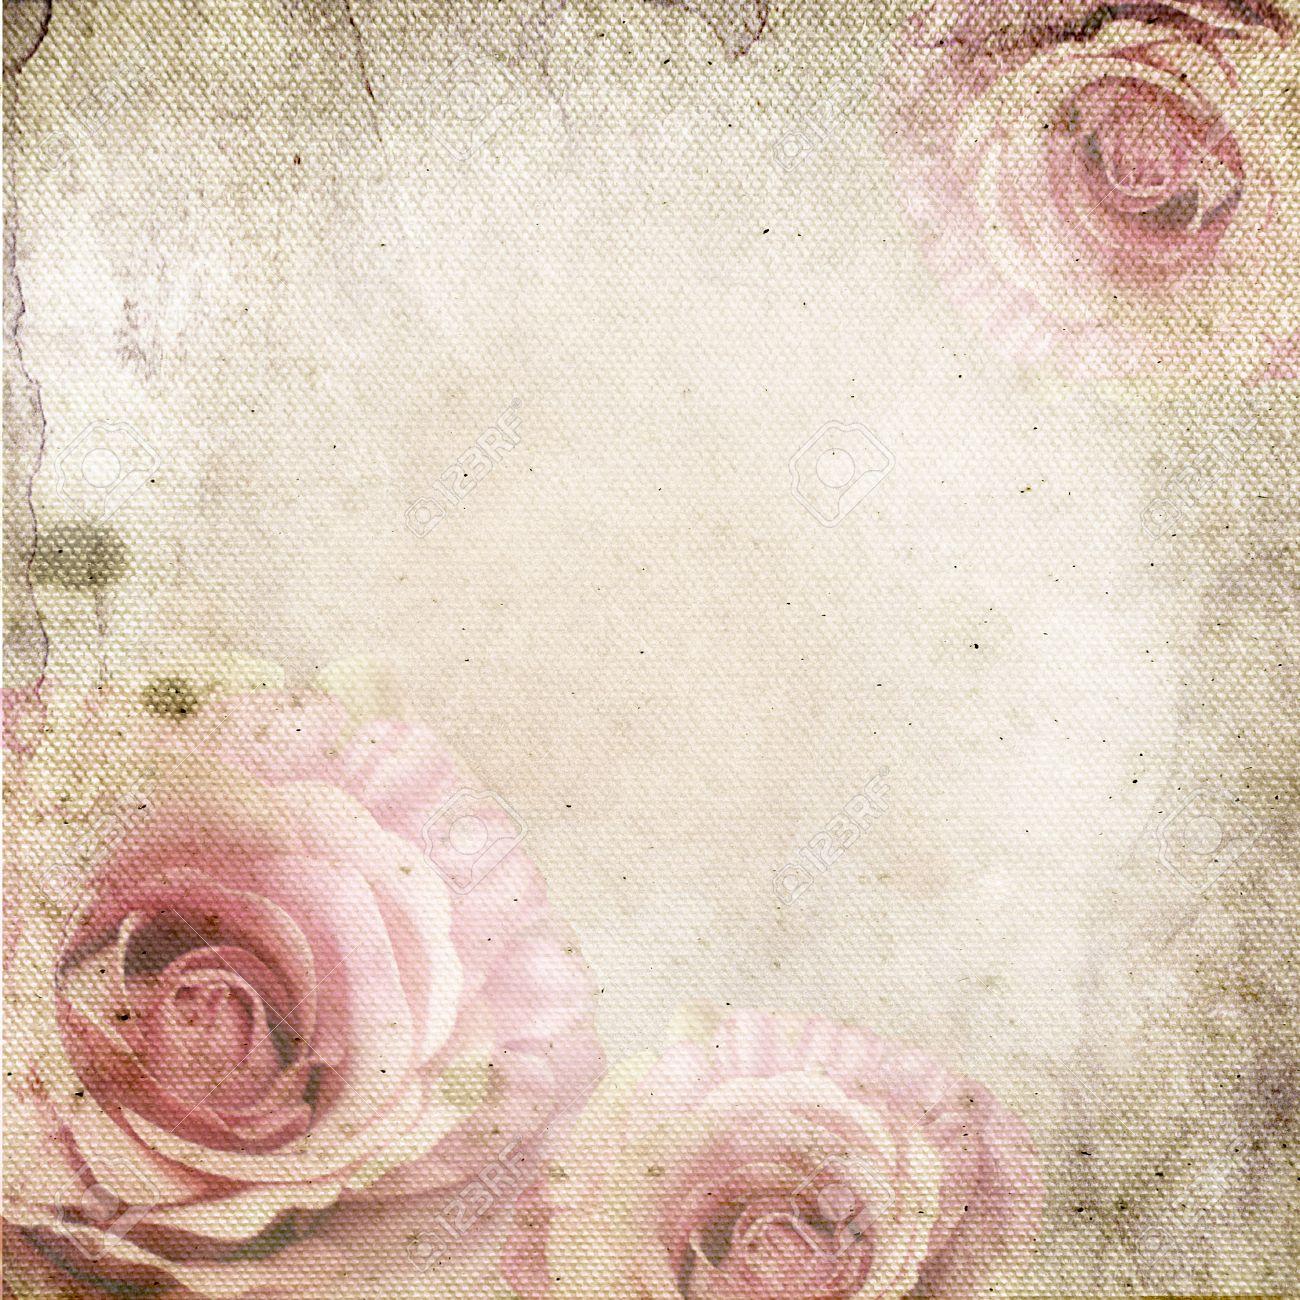 Unduh 510+ Background Foto Vintage HD Terbaru